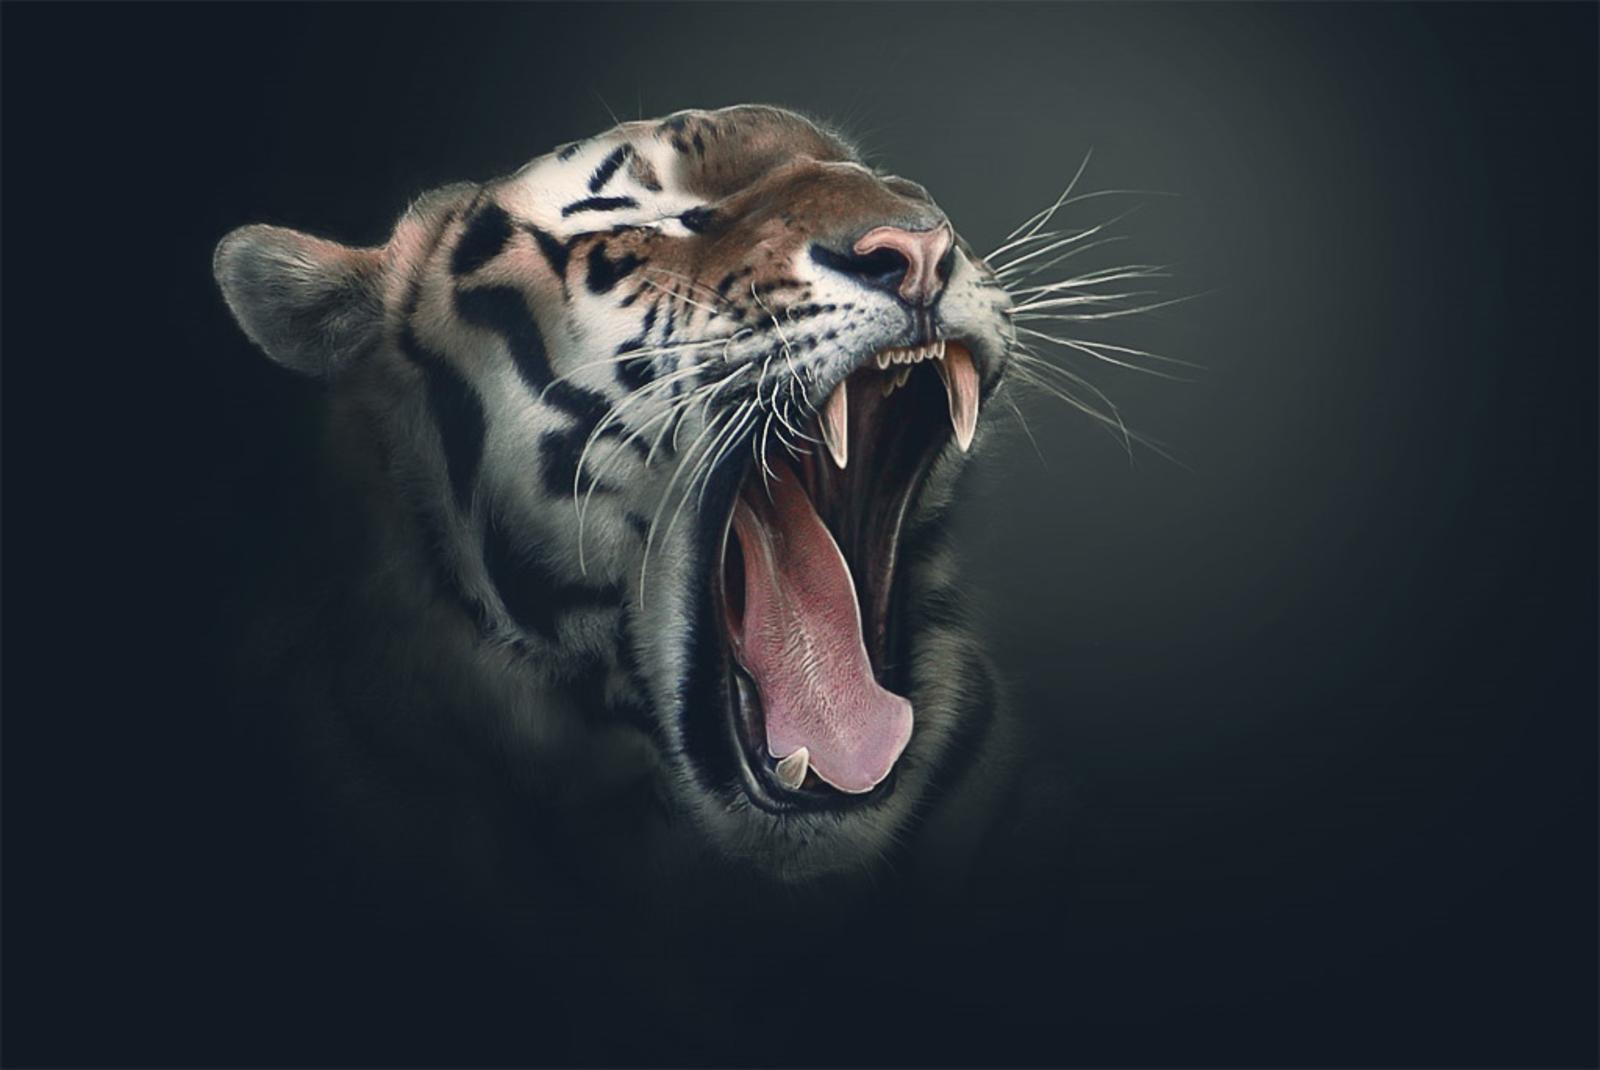 Free Tiger Wallpapers For Desktop - Wallpaper Cave